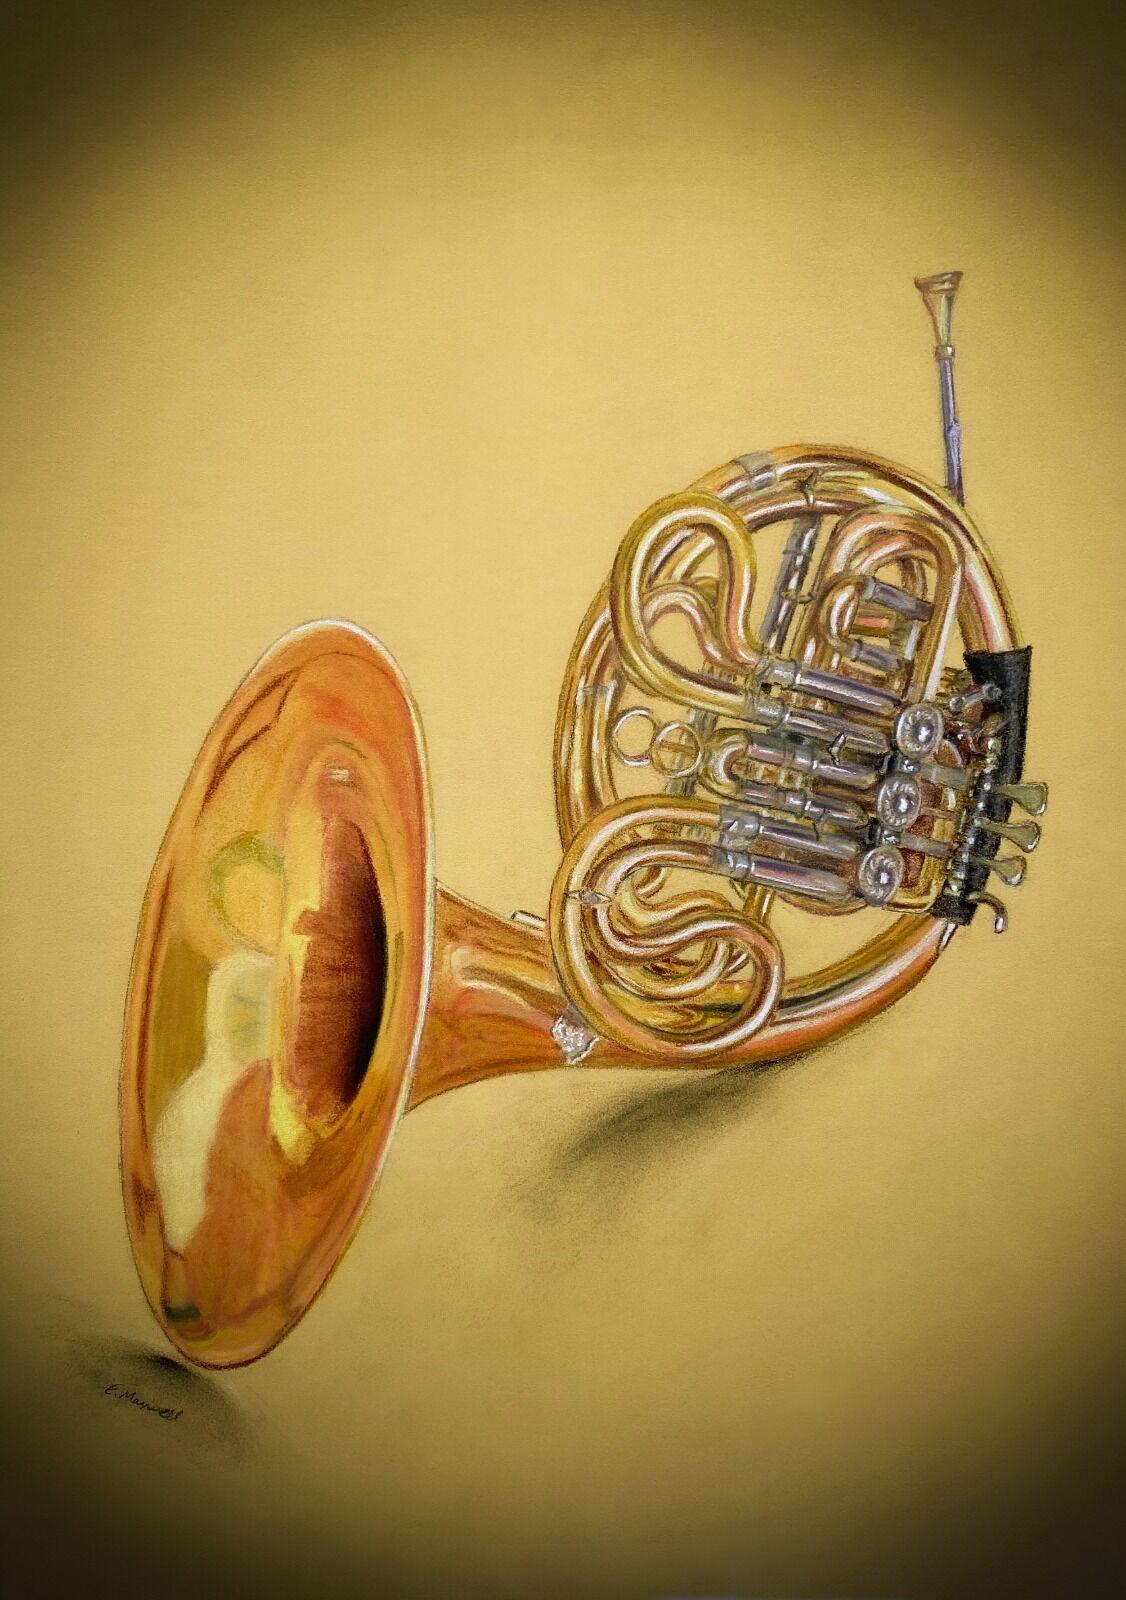 French Horn (Alexander 103)